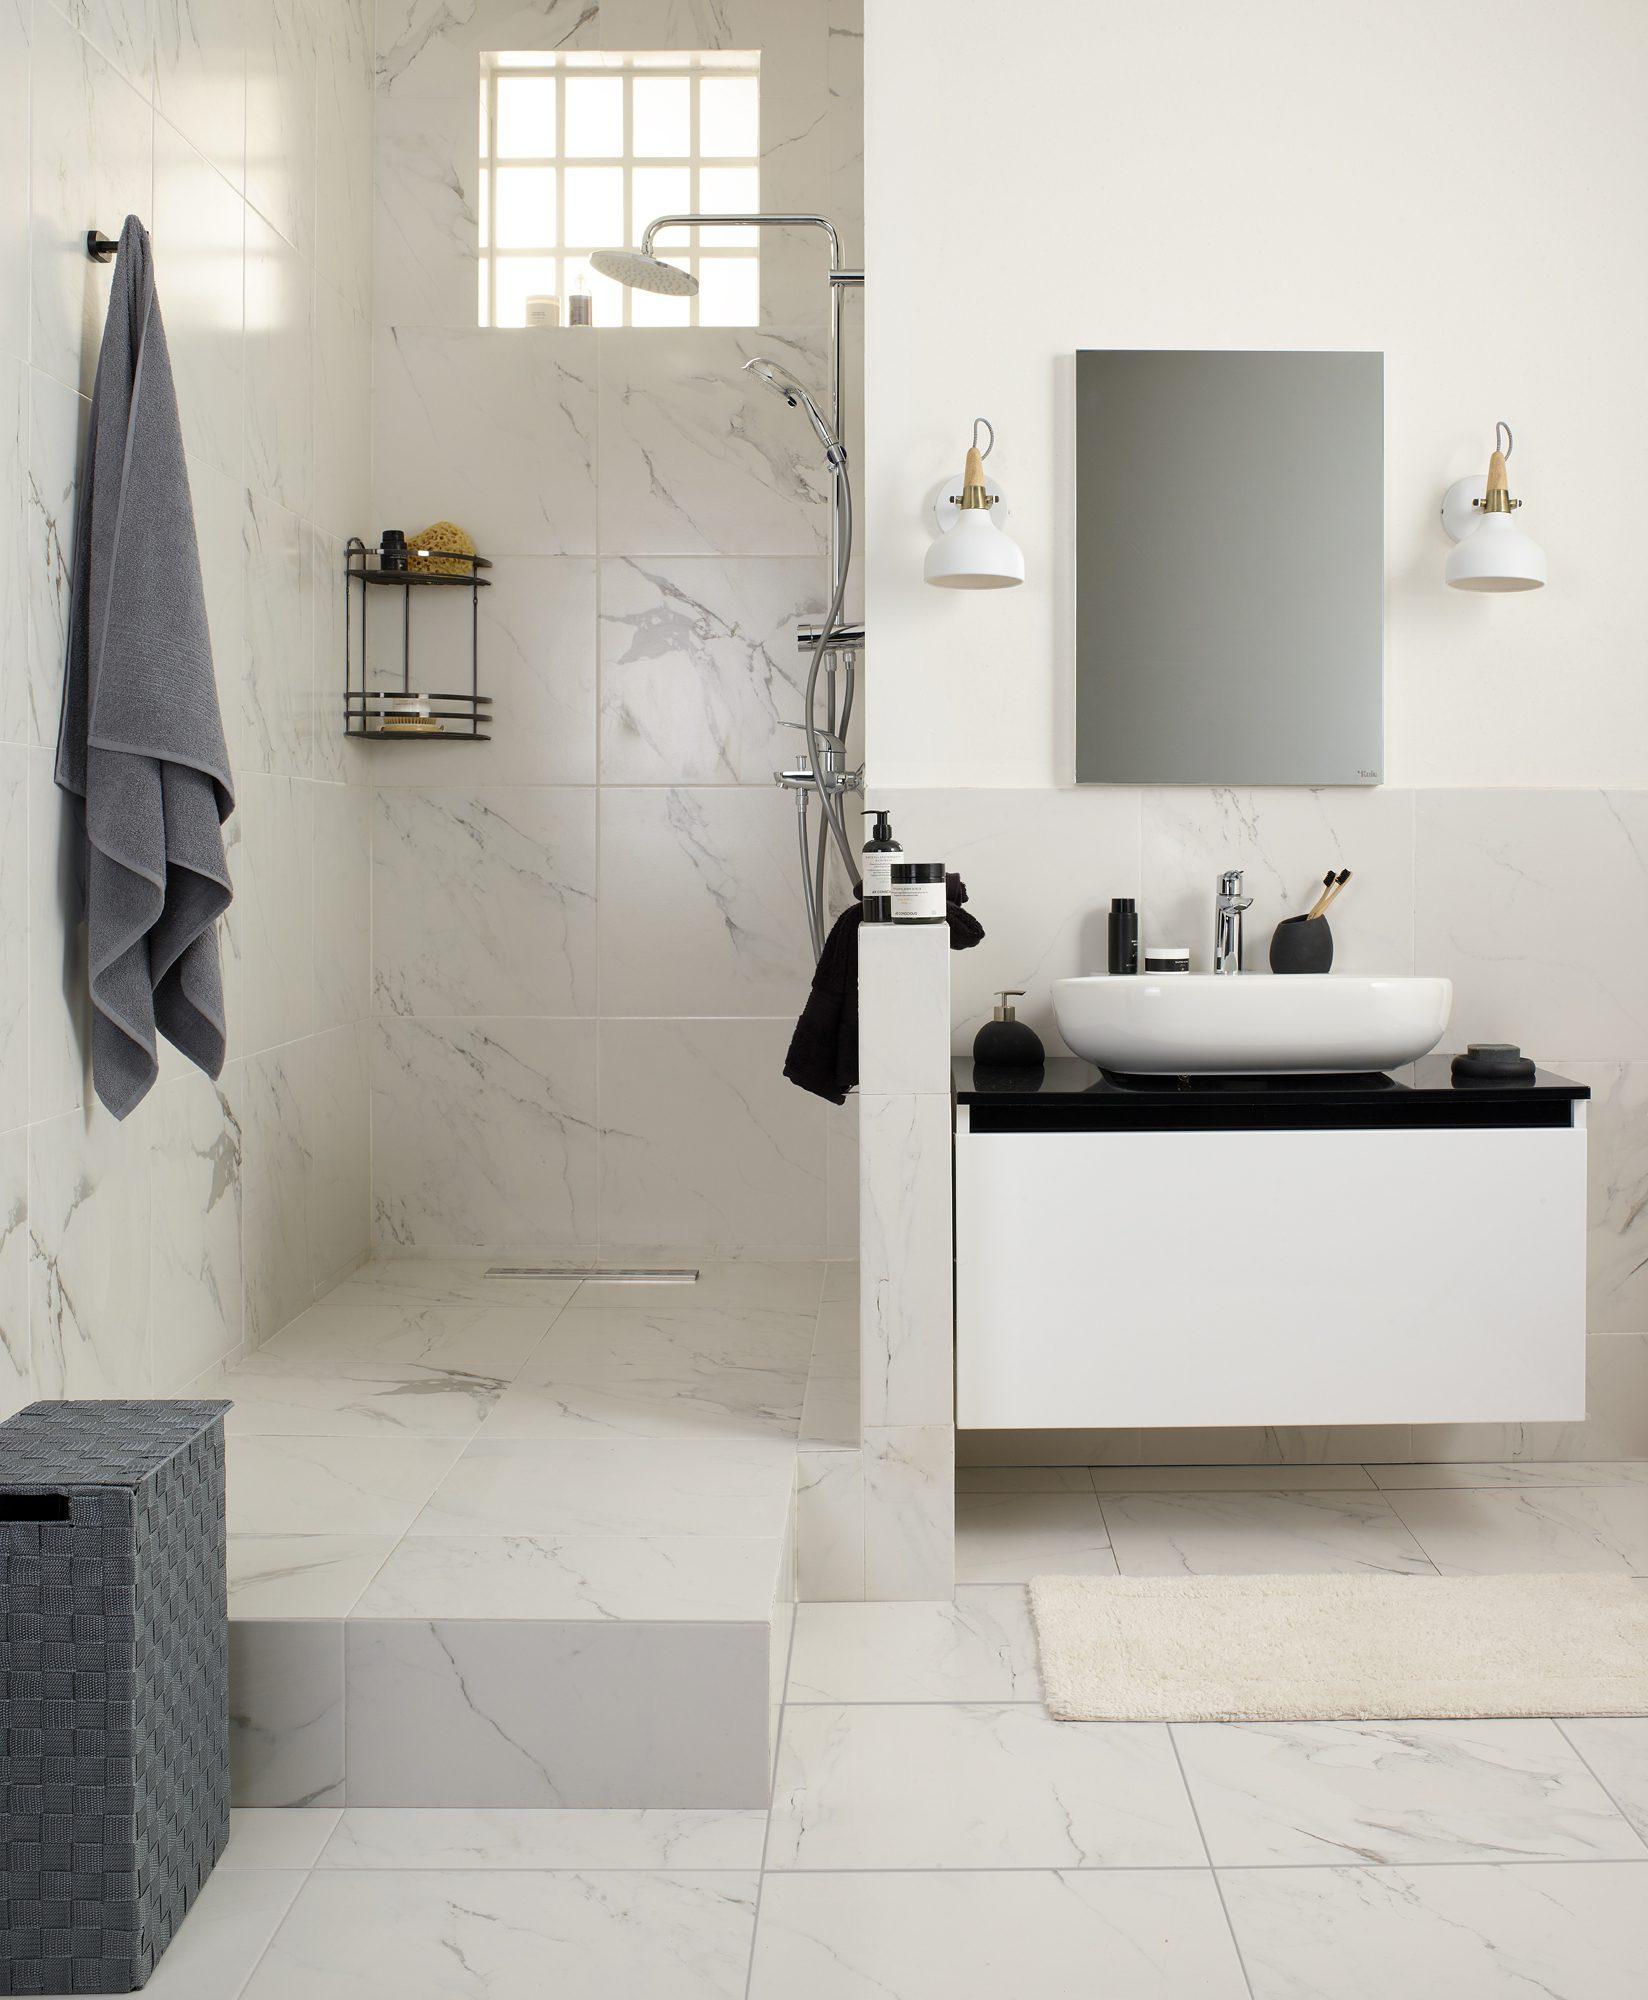 Banyo Dekorasyon Malzemeleri